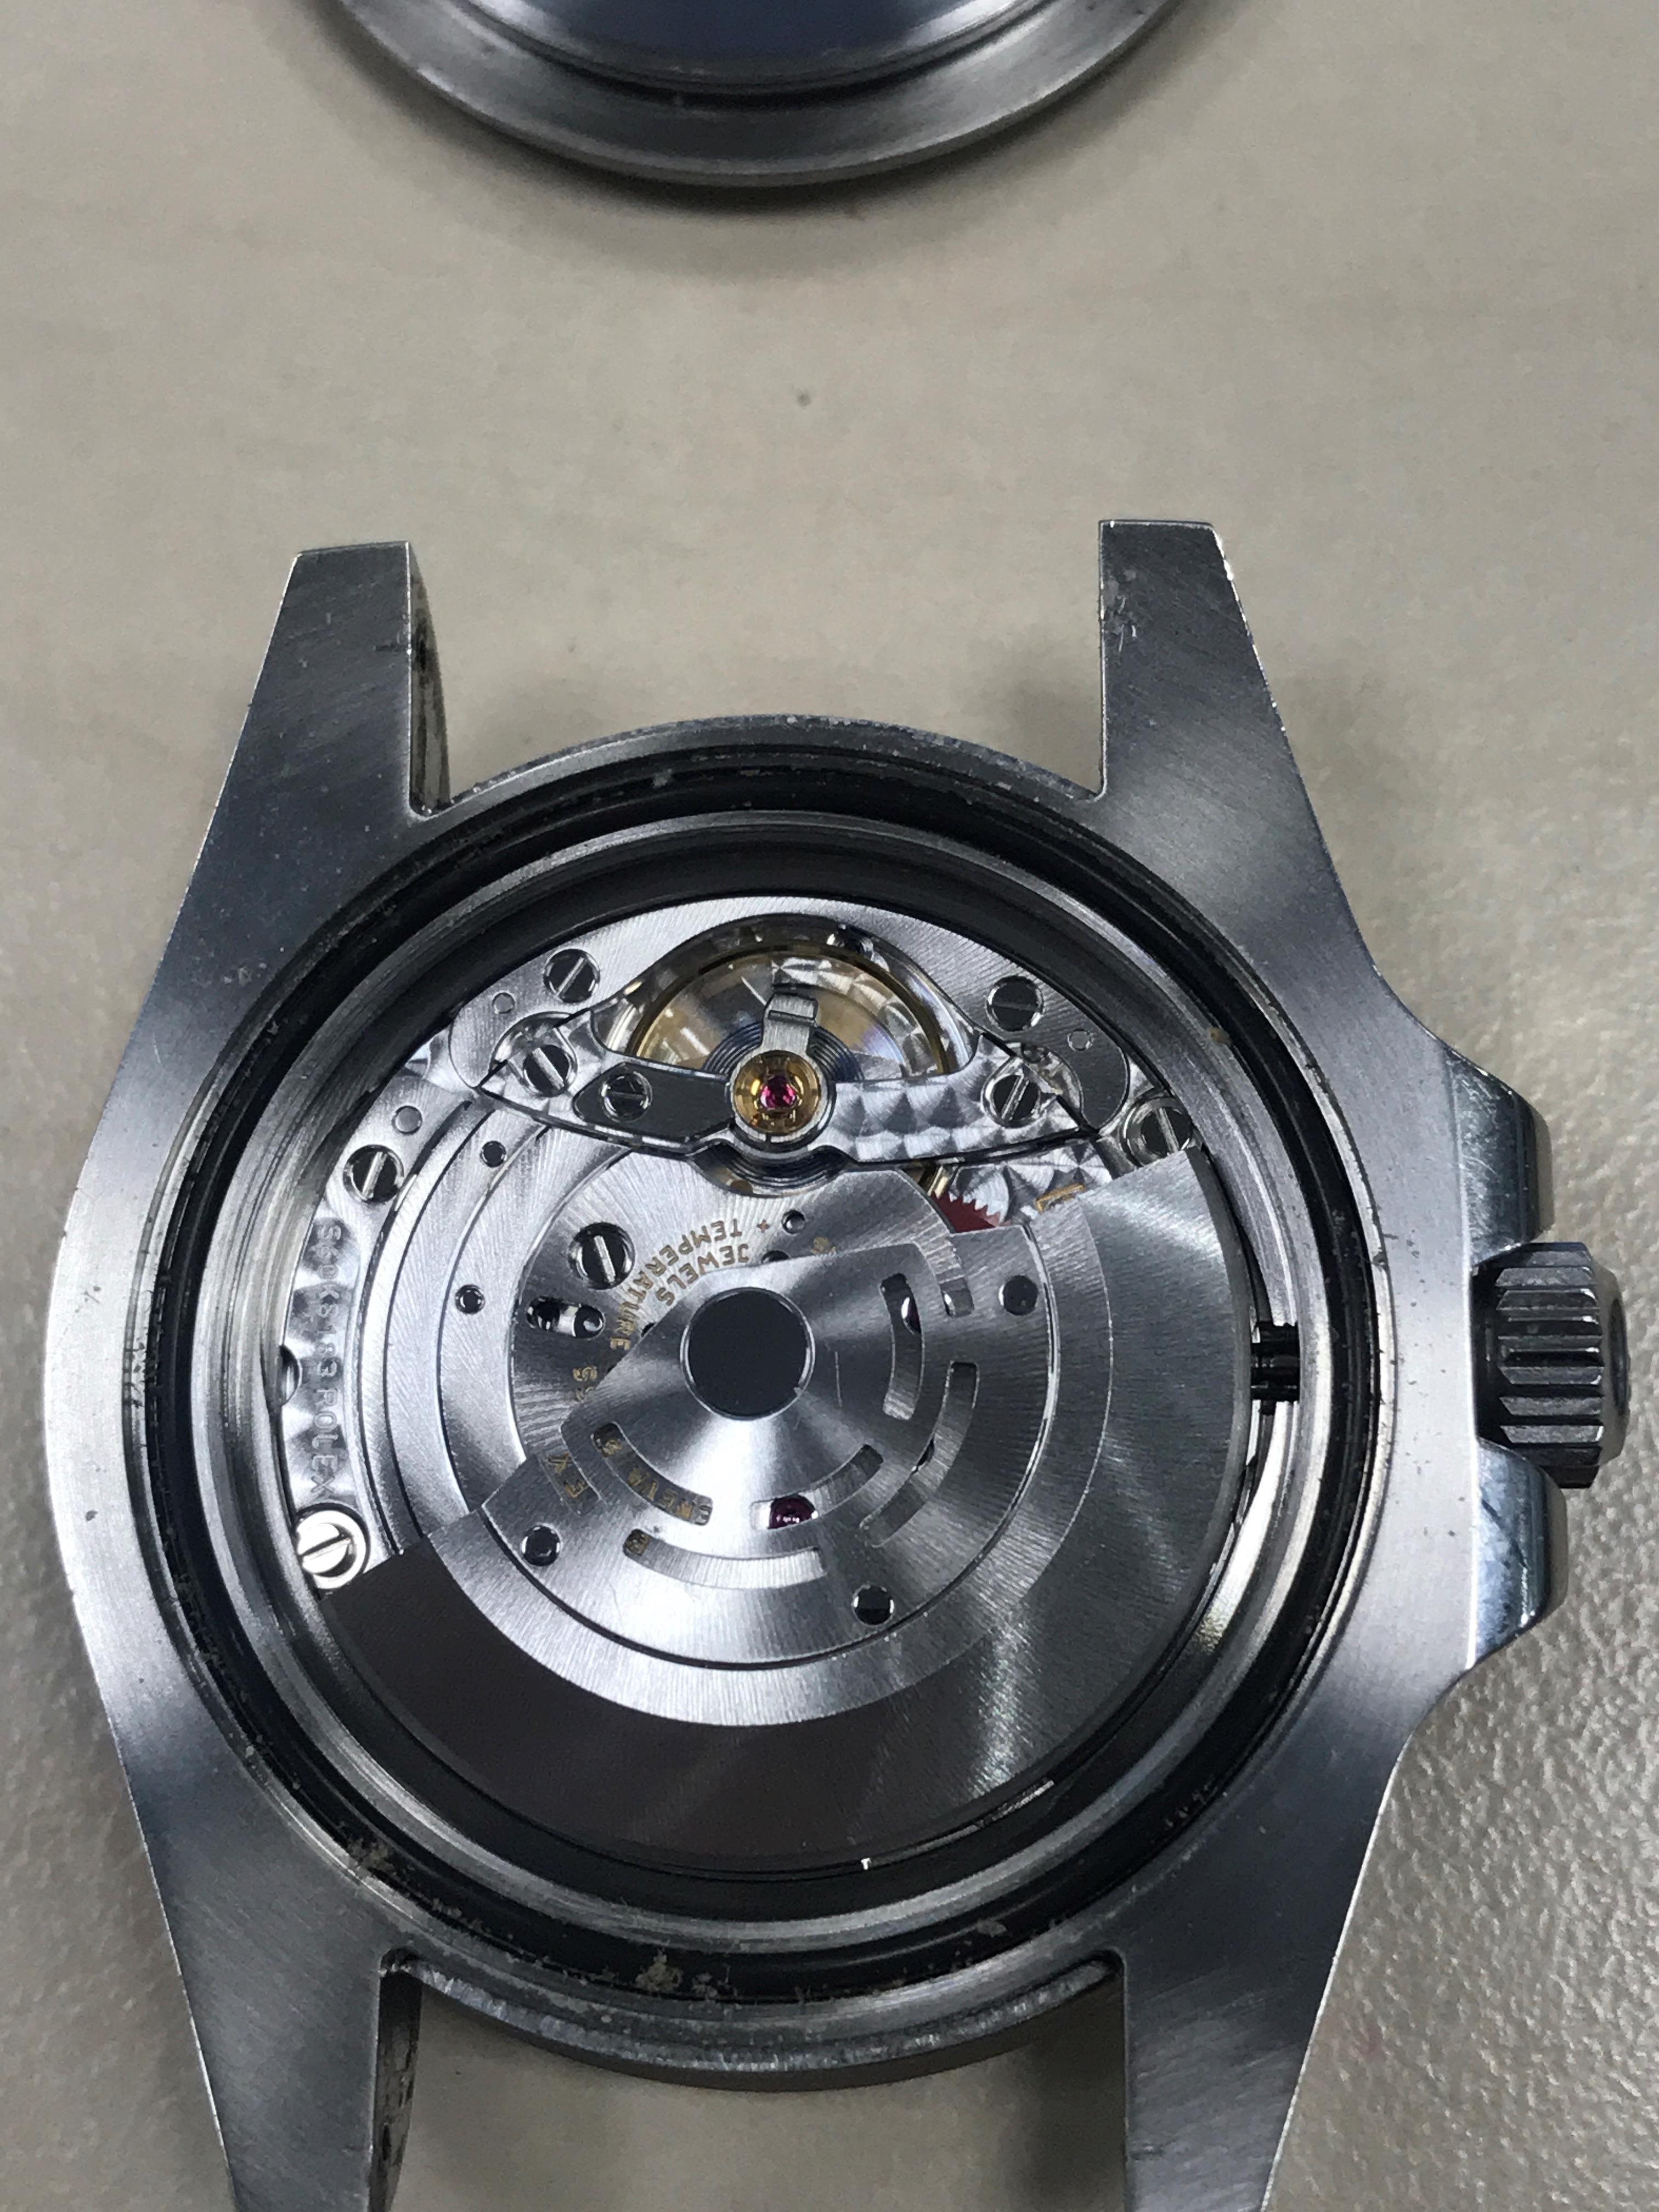 Lot 851 - A GENTLEMAN'S GMT-MASTER II STAINLESS STEEL WATCH